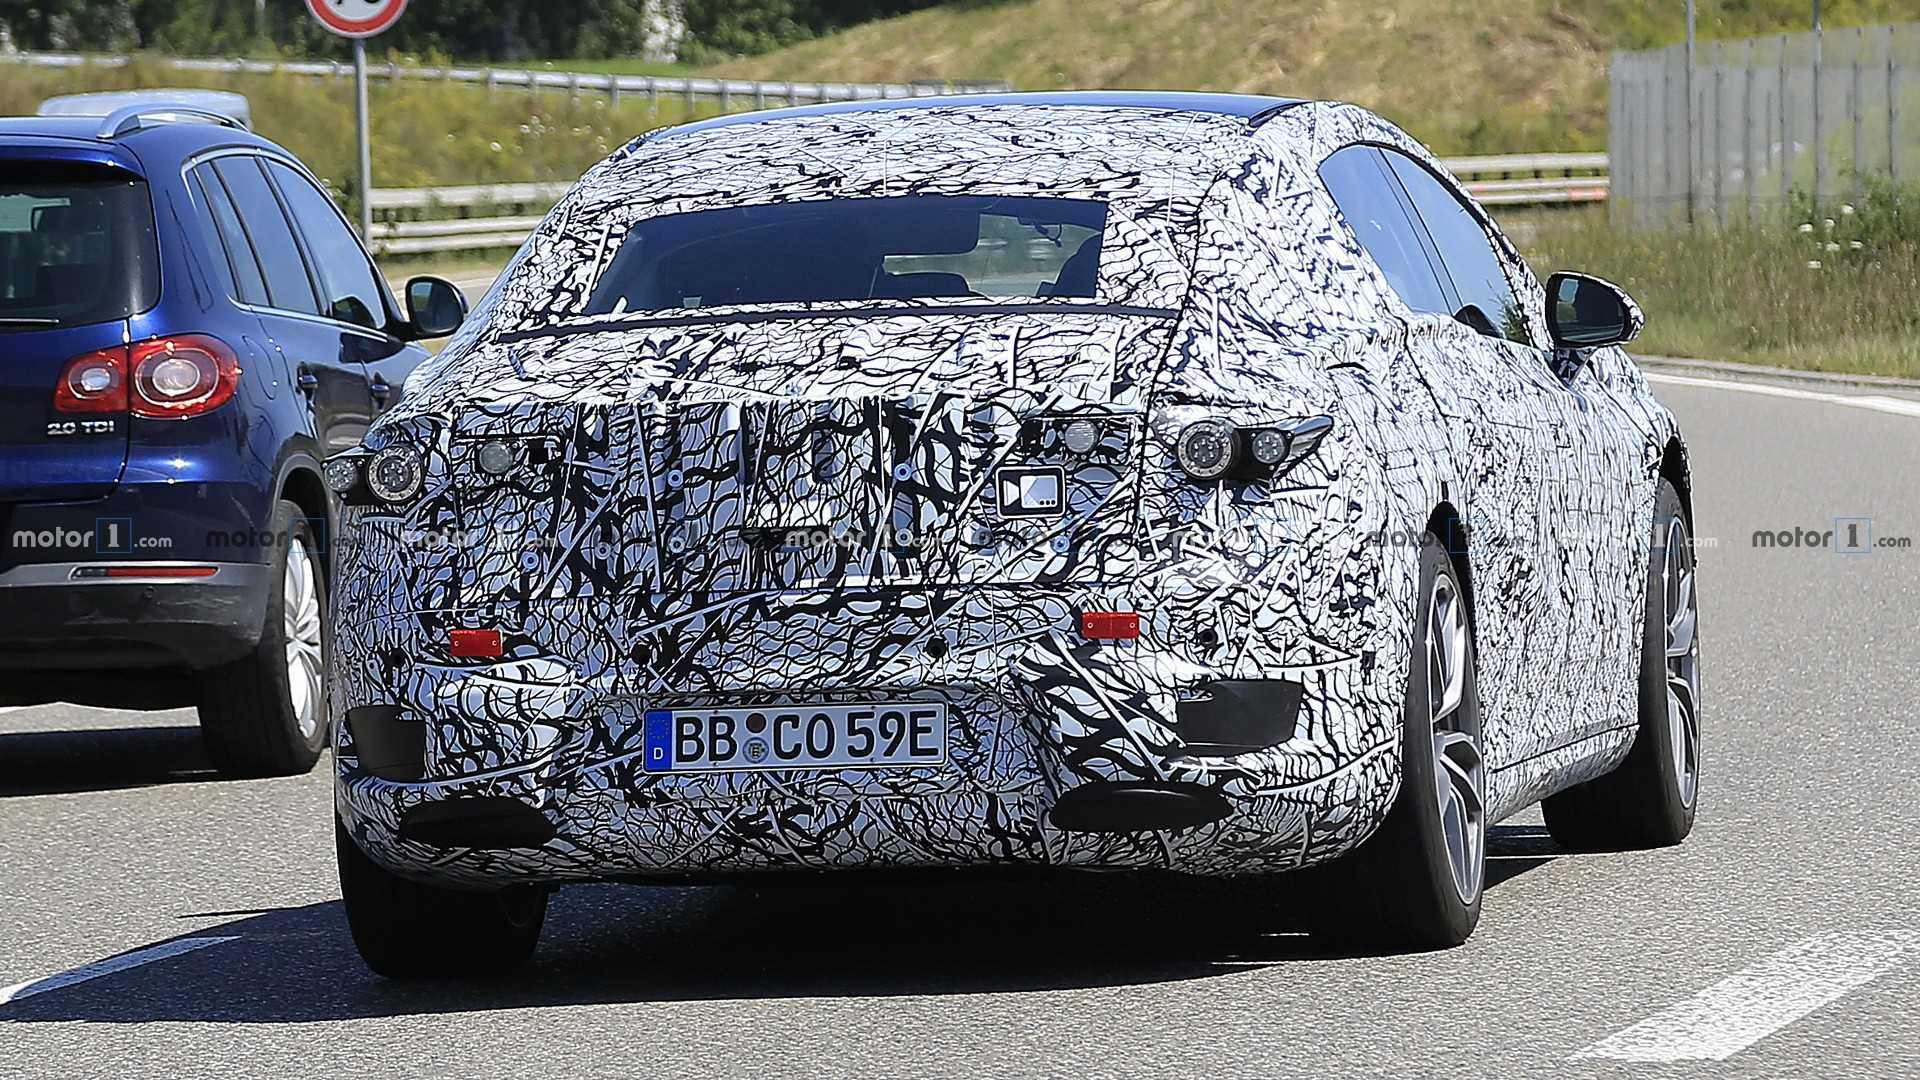 2021 - [Mercedes] EQS - Page 2 2021-mercedes-eqs-spy-photo